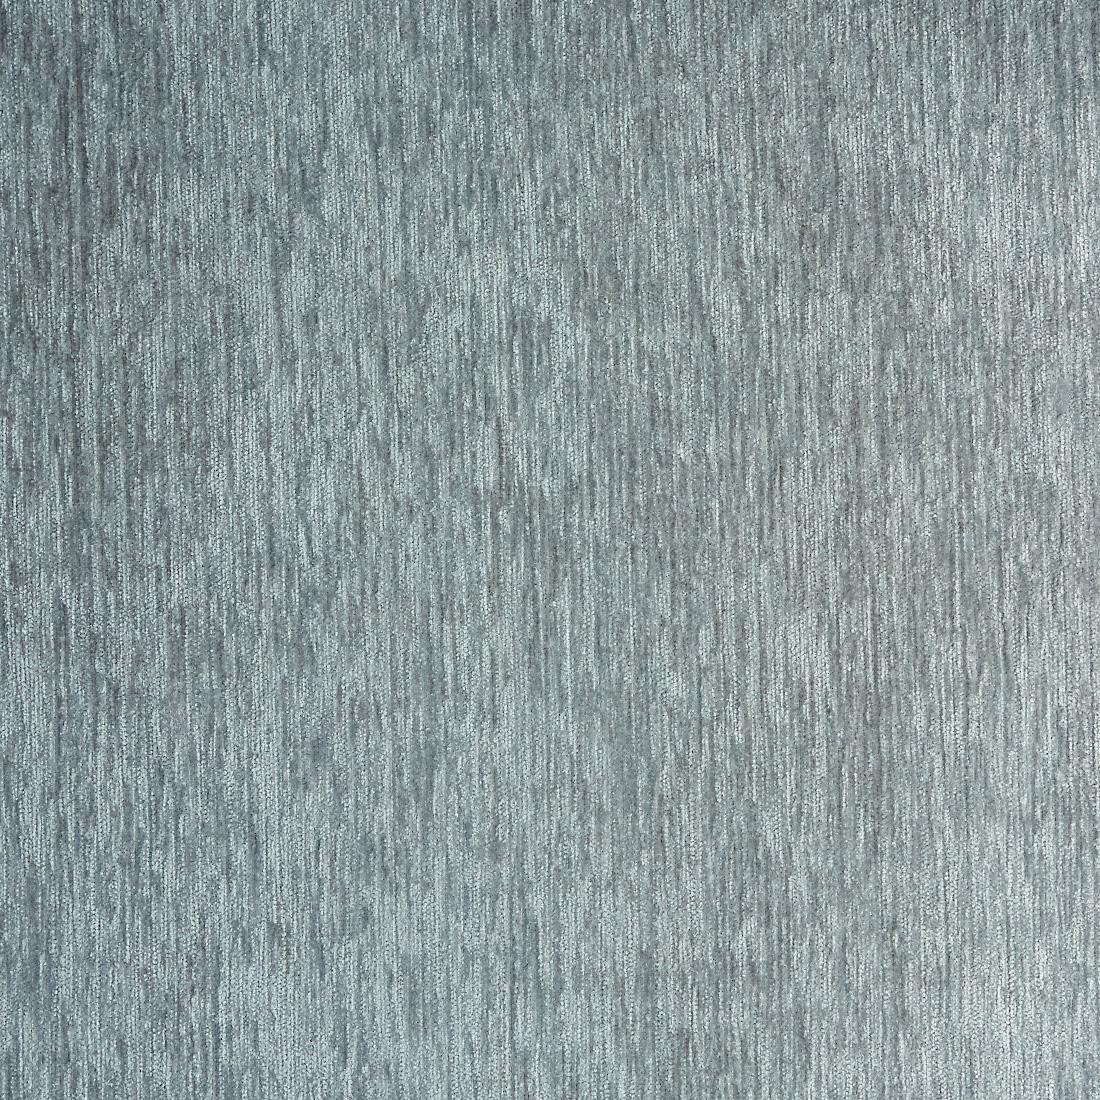 Zeros Chenille Grey Upholstery Fabric